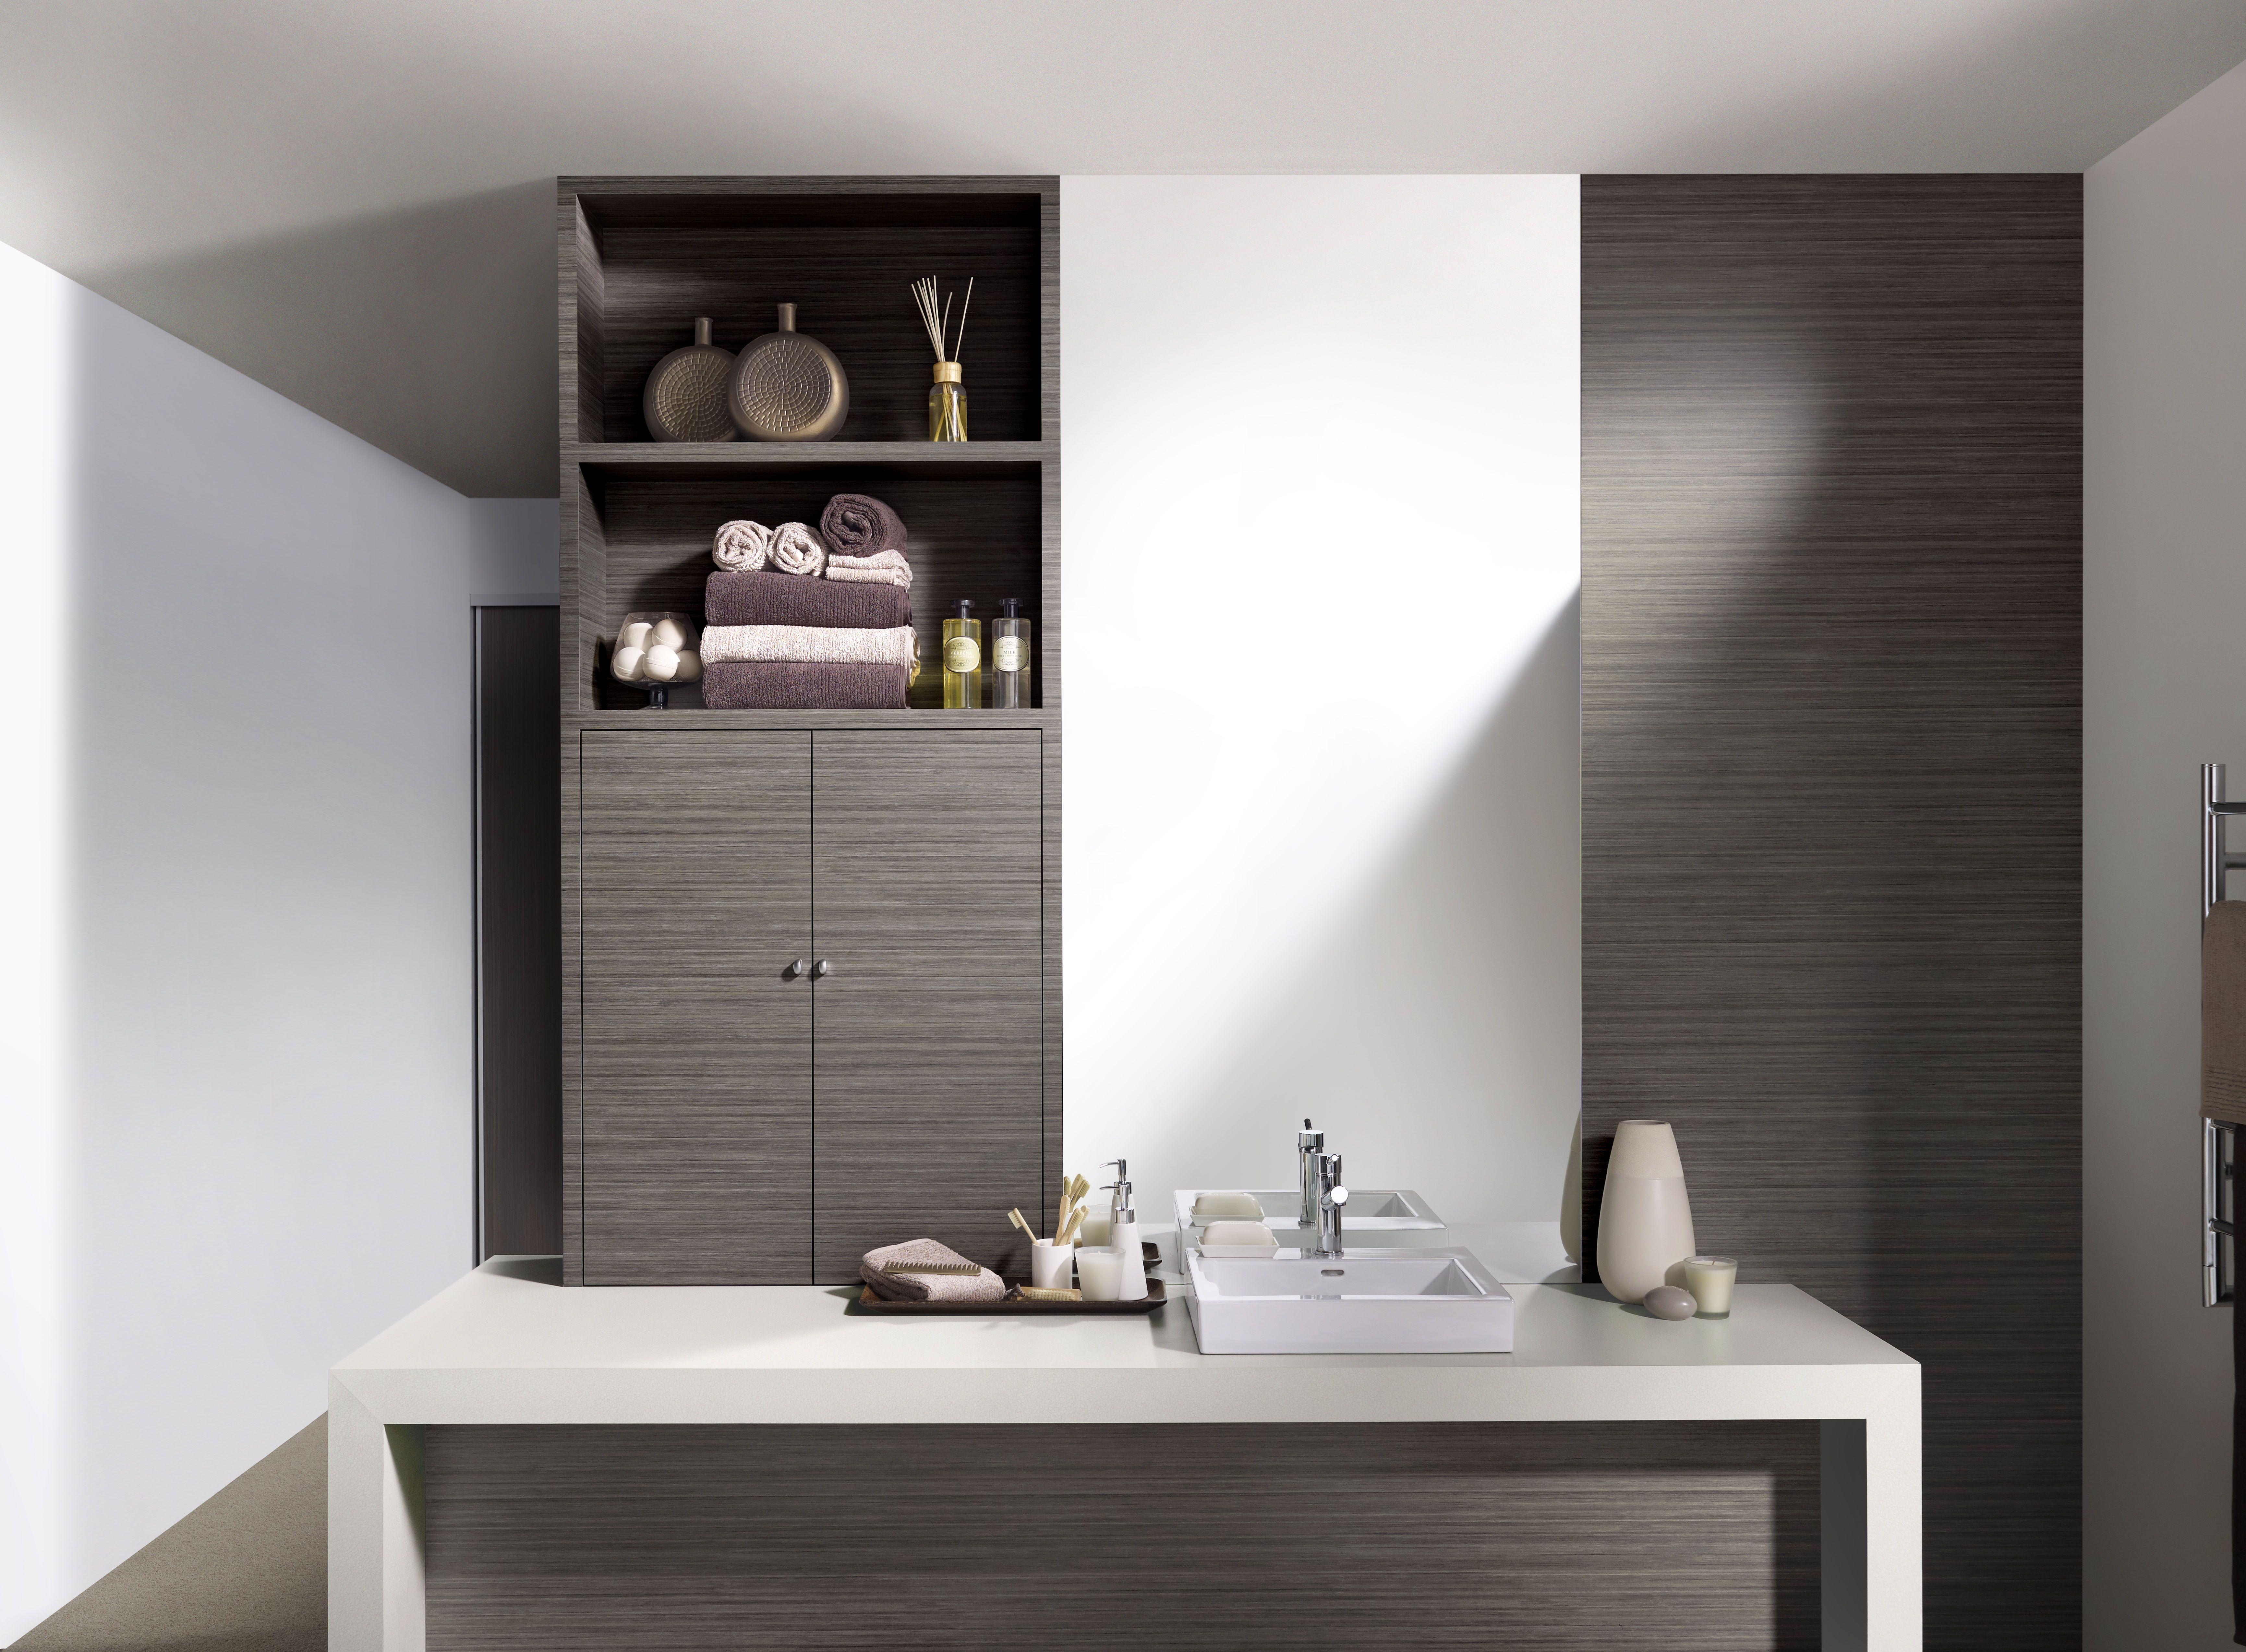 Bathroom cabinets Formica Melamine Doors (square edge profile ...